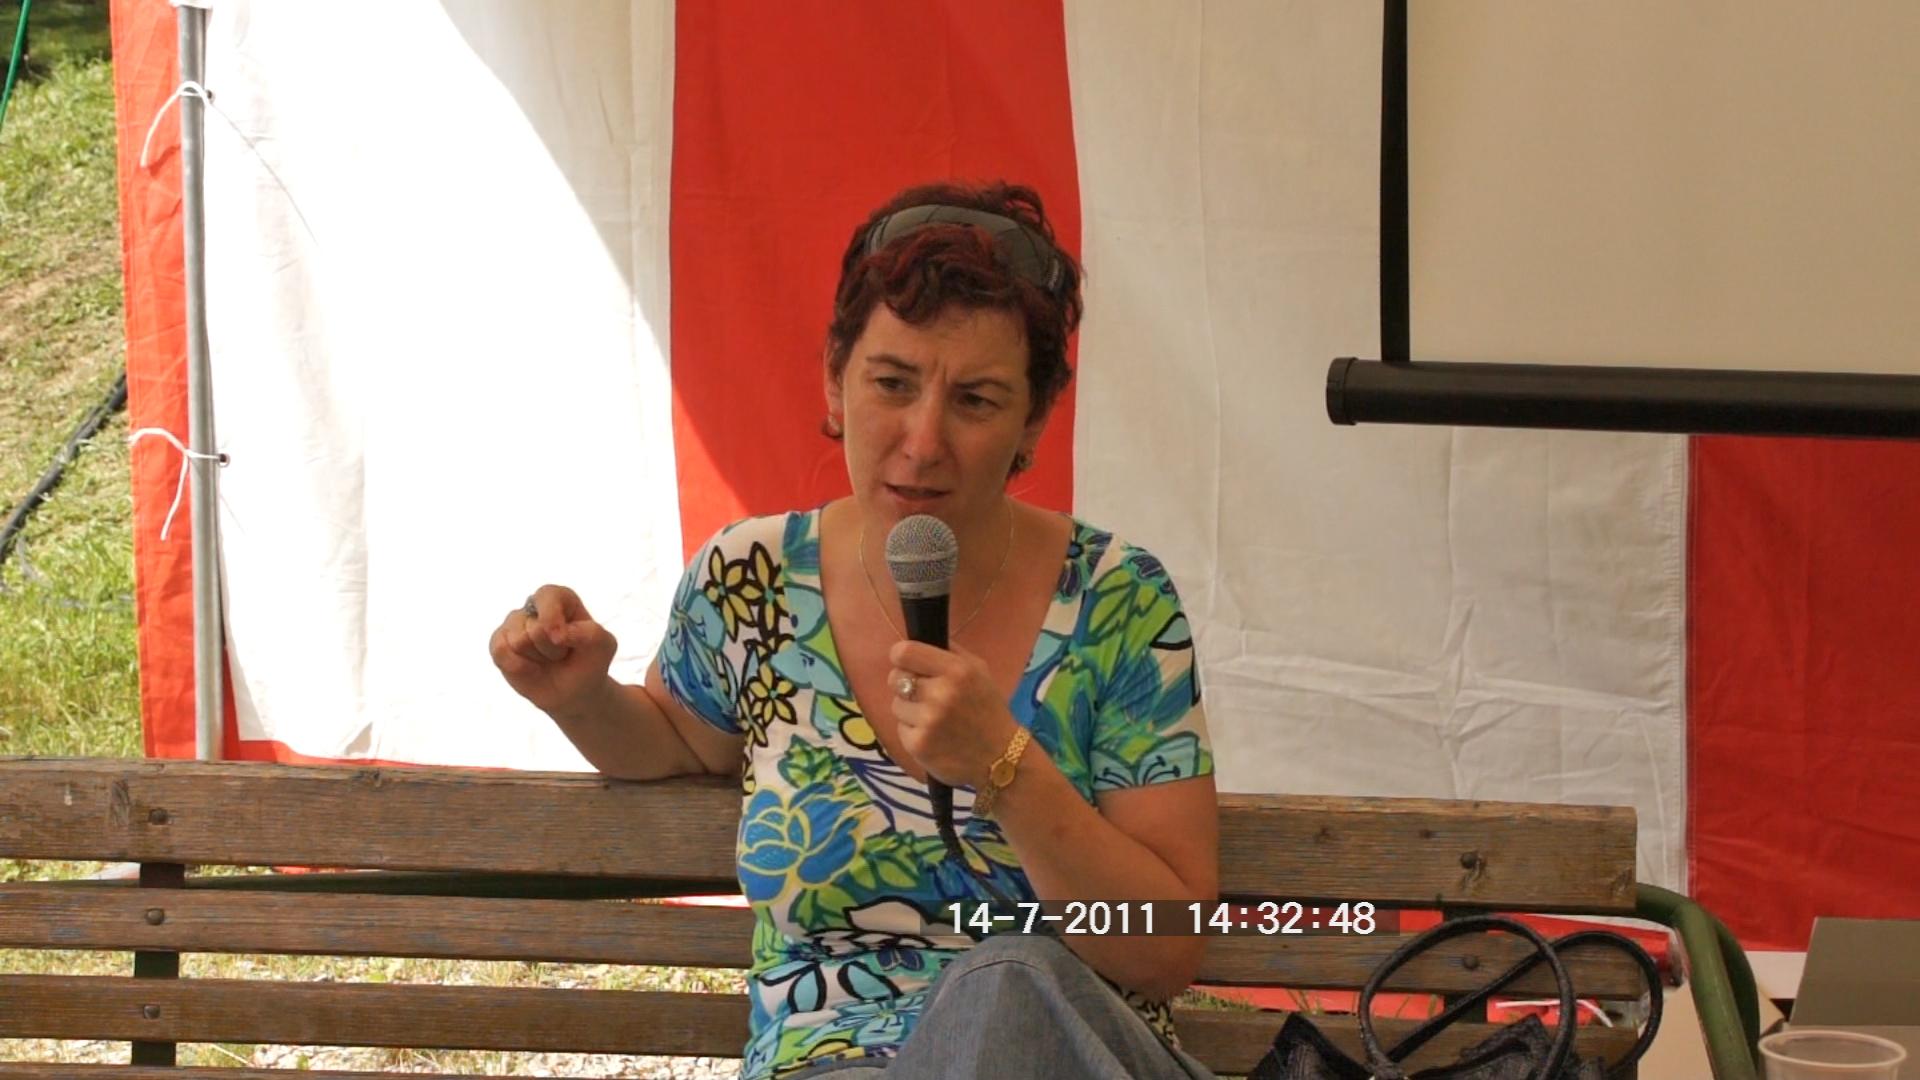 2011-07-14 DH tábor, Vrabec Mária